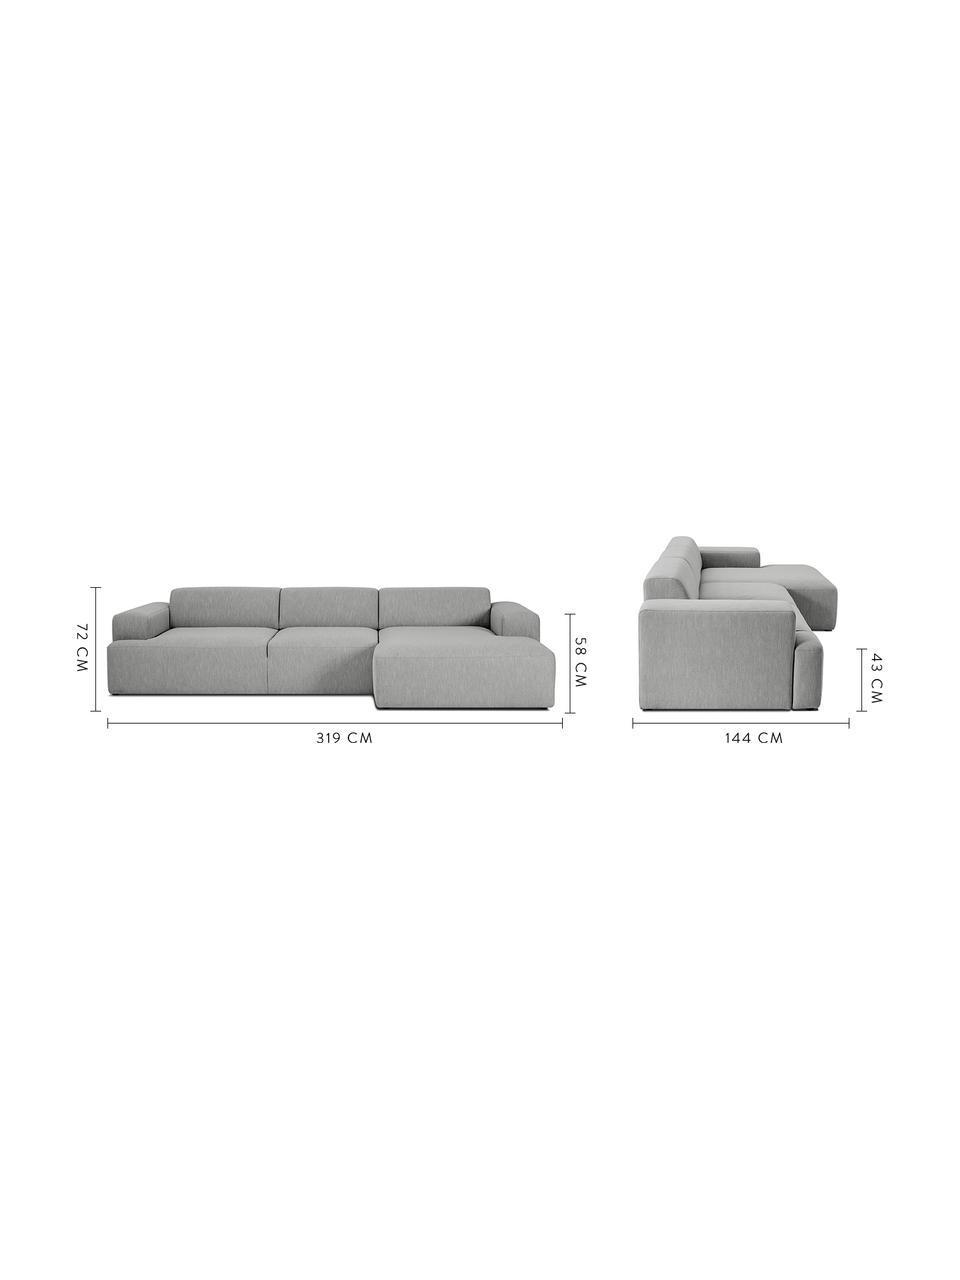 Ecksofa Melva (4-Sitzer) in Grau, Bezug: Polyester Der hochwertige, Gestell: Massives Kiefernholz, Spa, Füße: Kiefernholz, Webstoff Grau, B 319 x T 144 cm